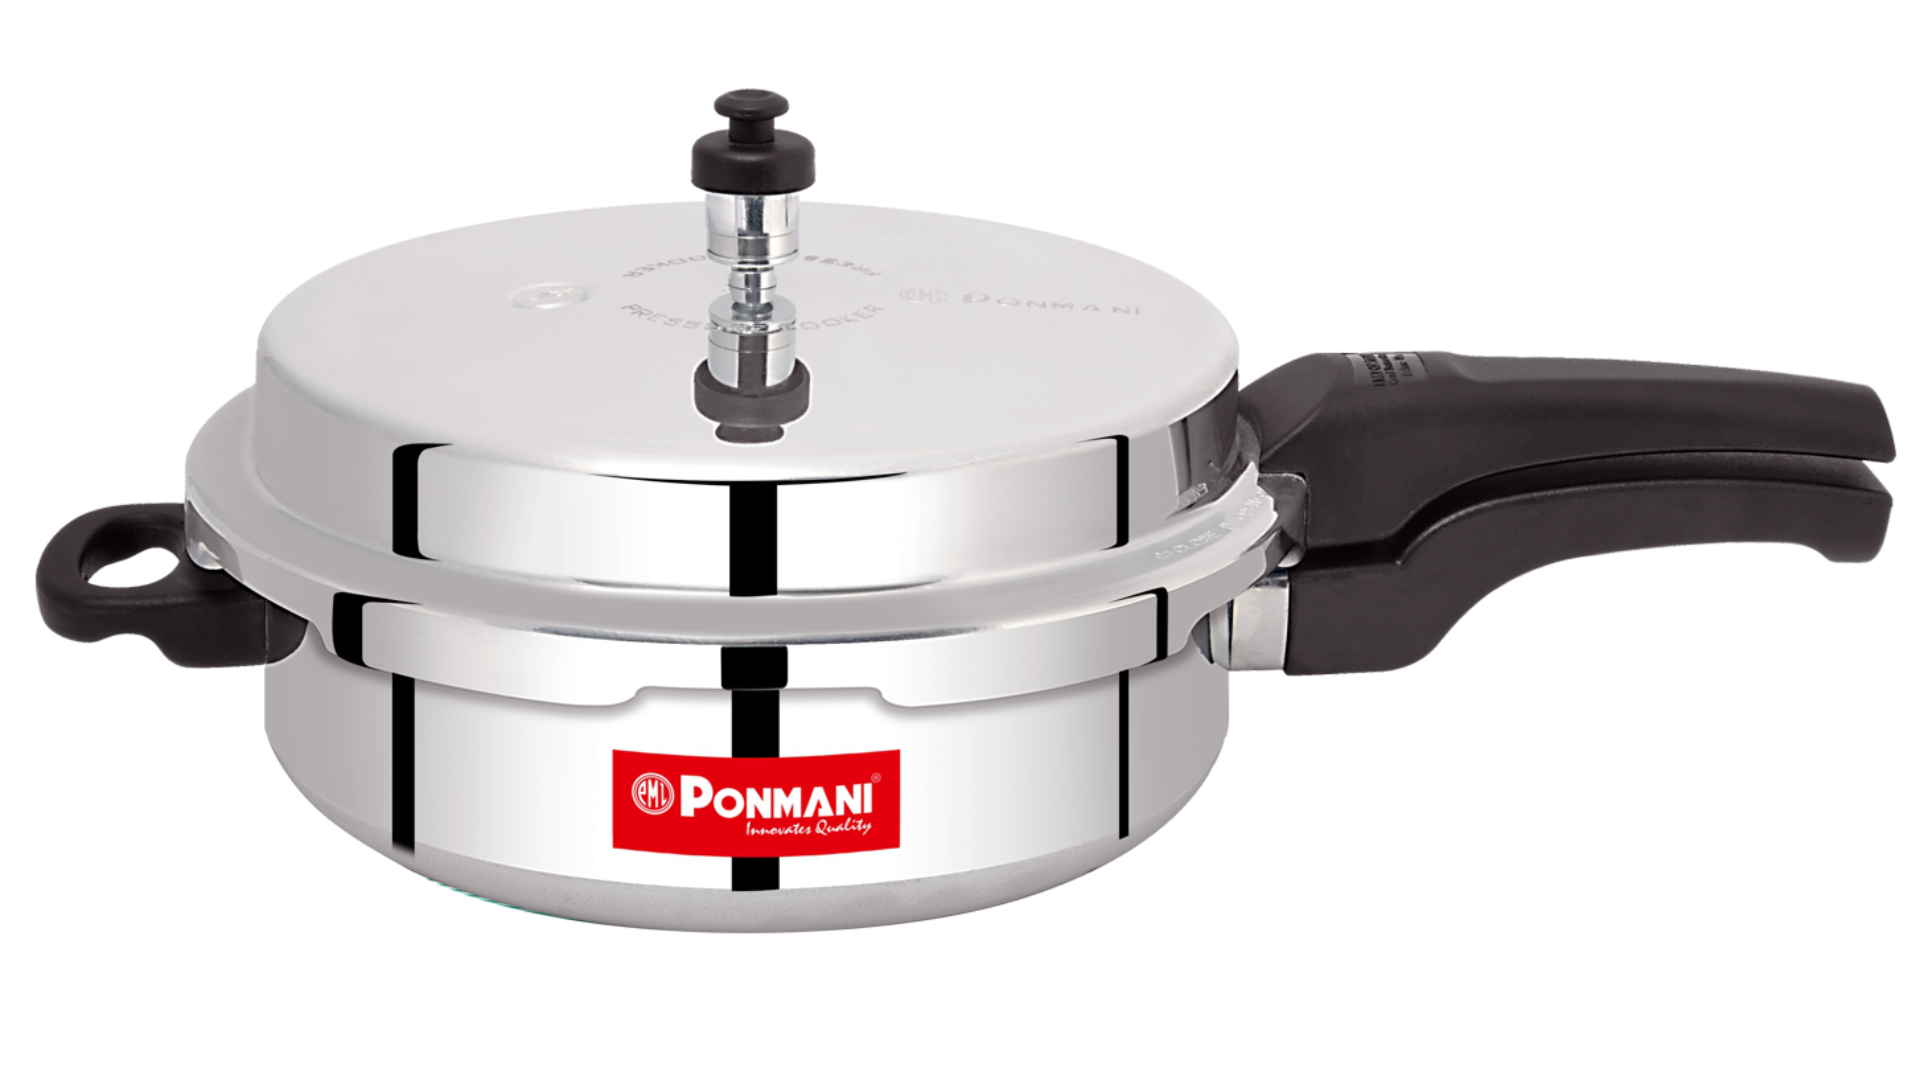 Ponmani Power Plus Table Top Wet Grinder